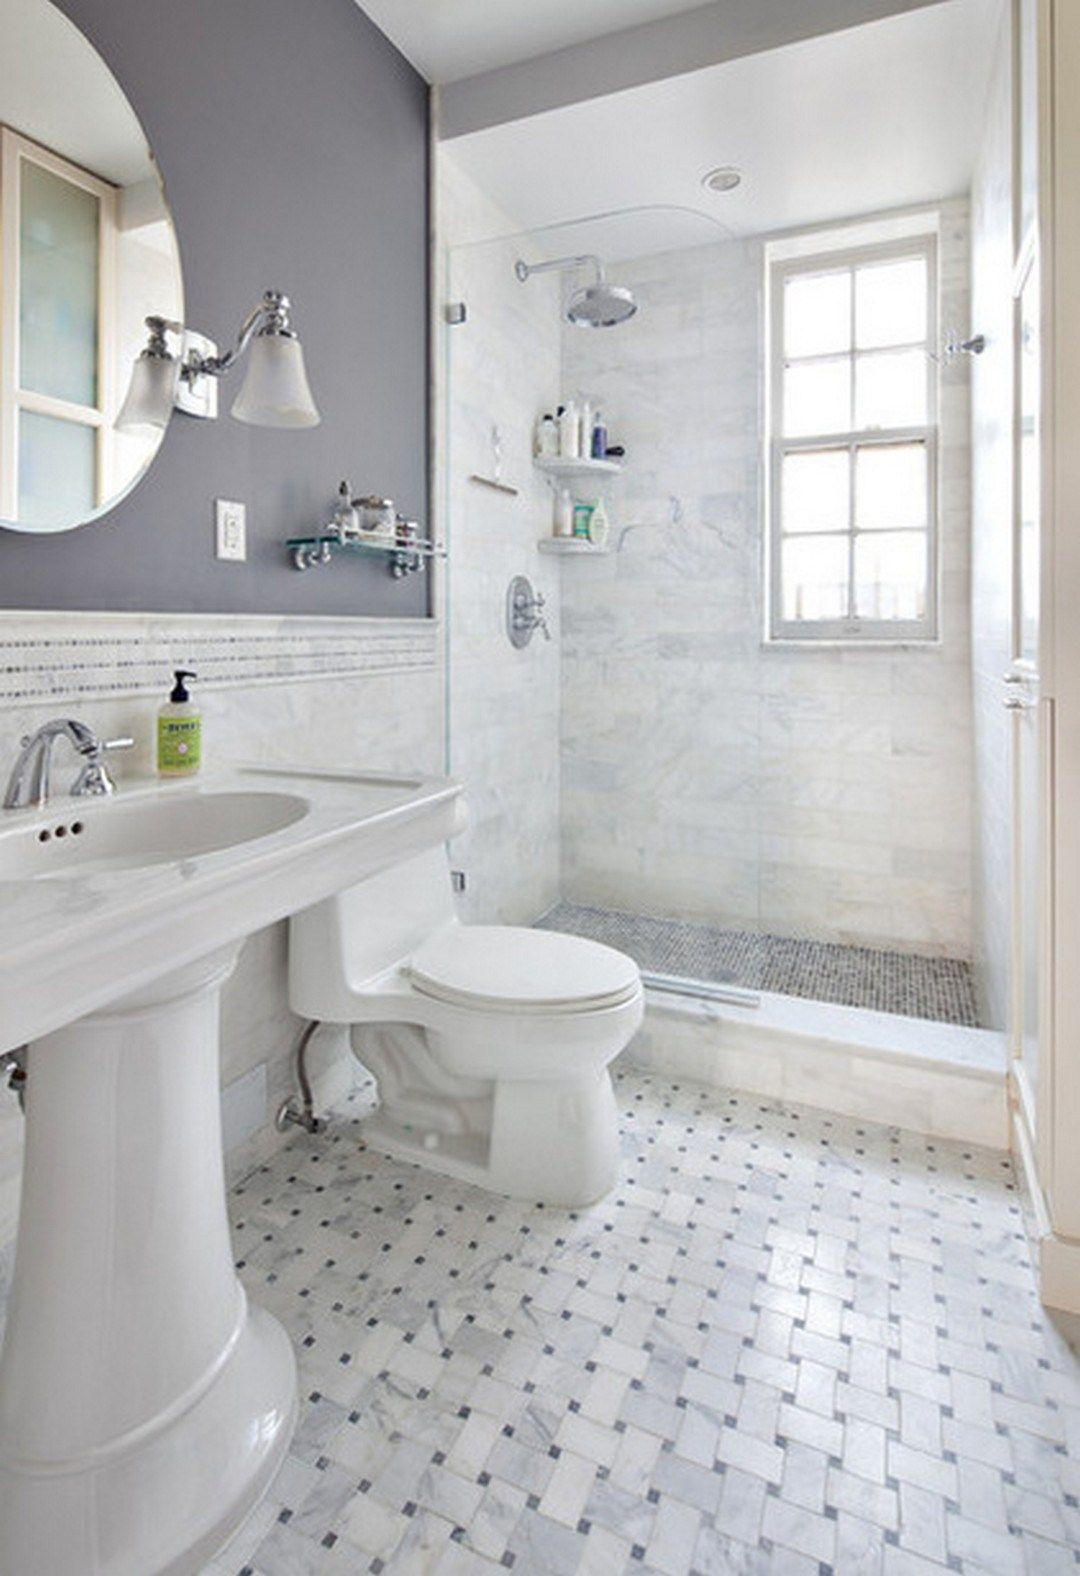 Best Decorative Bathroom Tile Ideas - Colorful Tiled Bathrooms ...